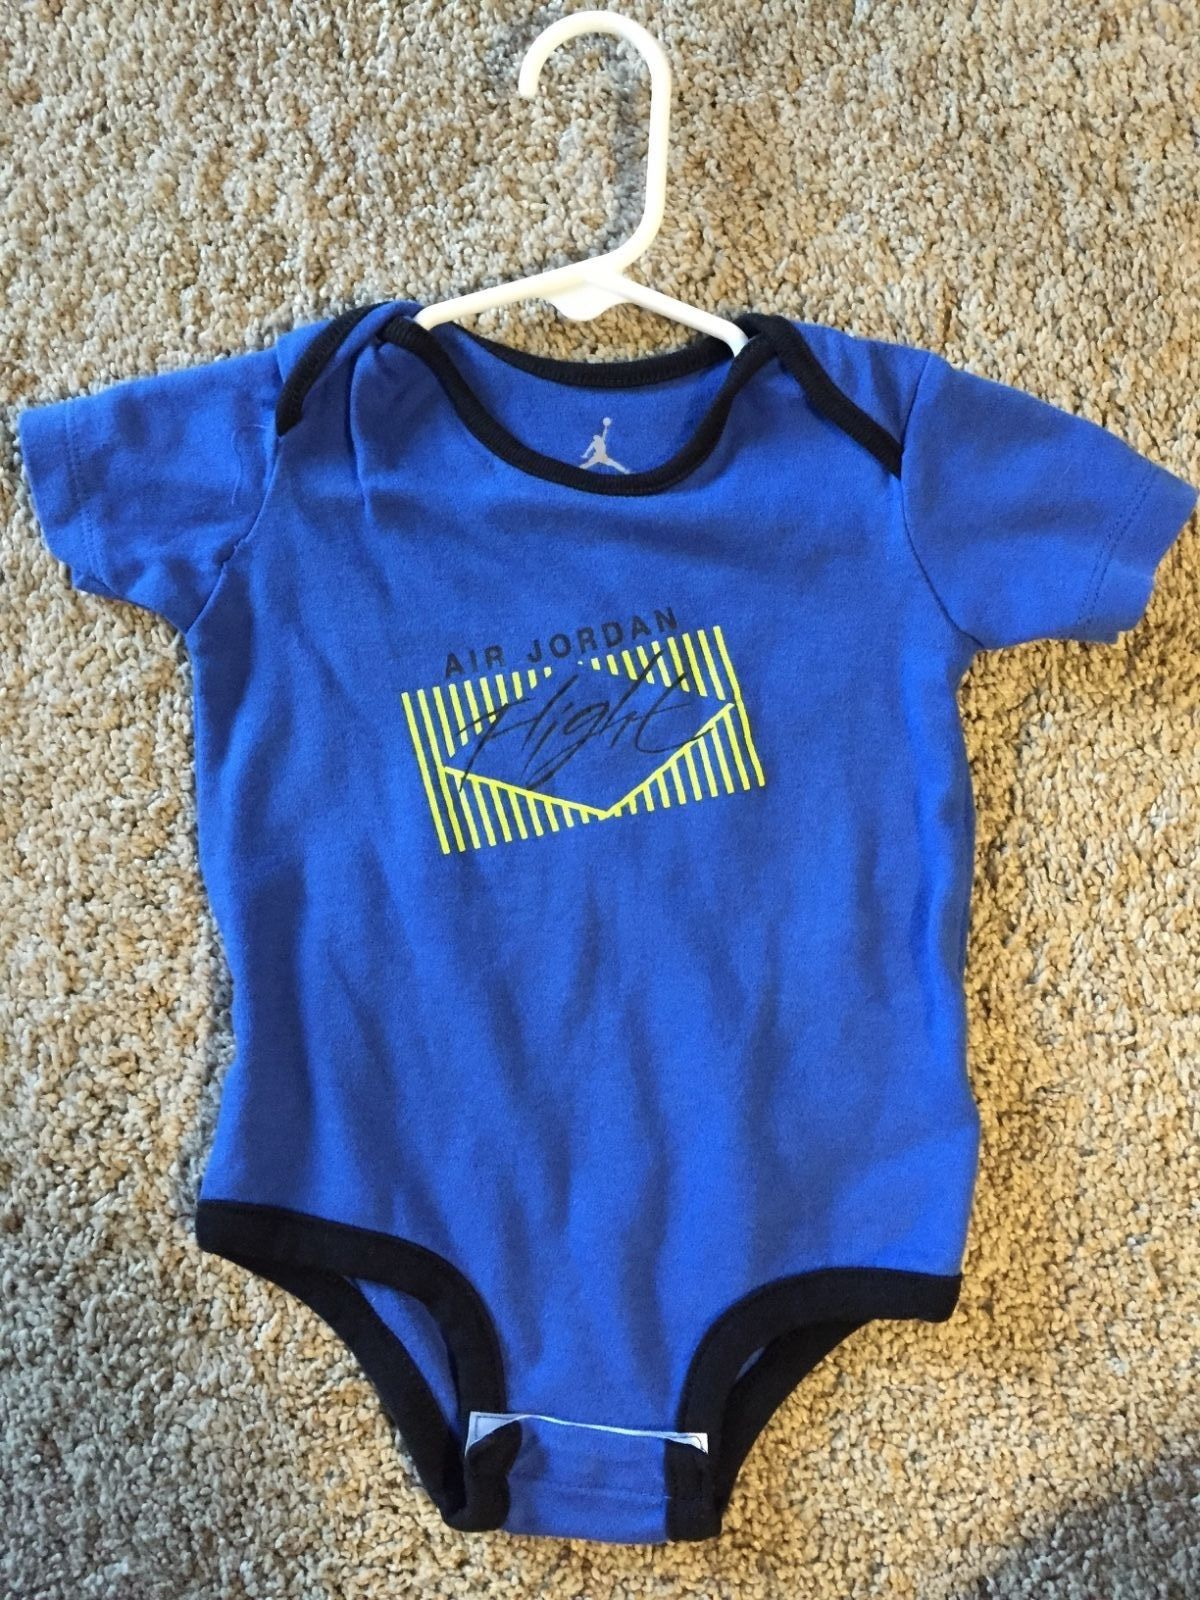 Michael Jordan Baby Clothing Michael Jordan Nike Baby e Piece